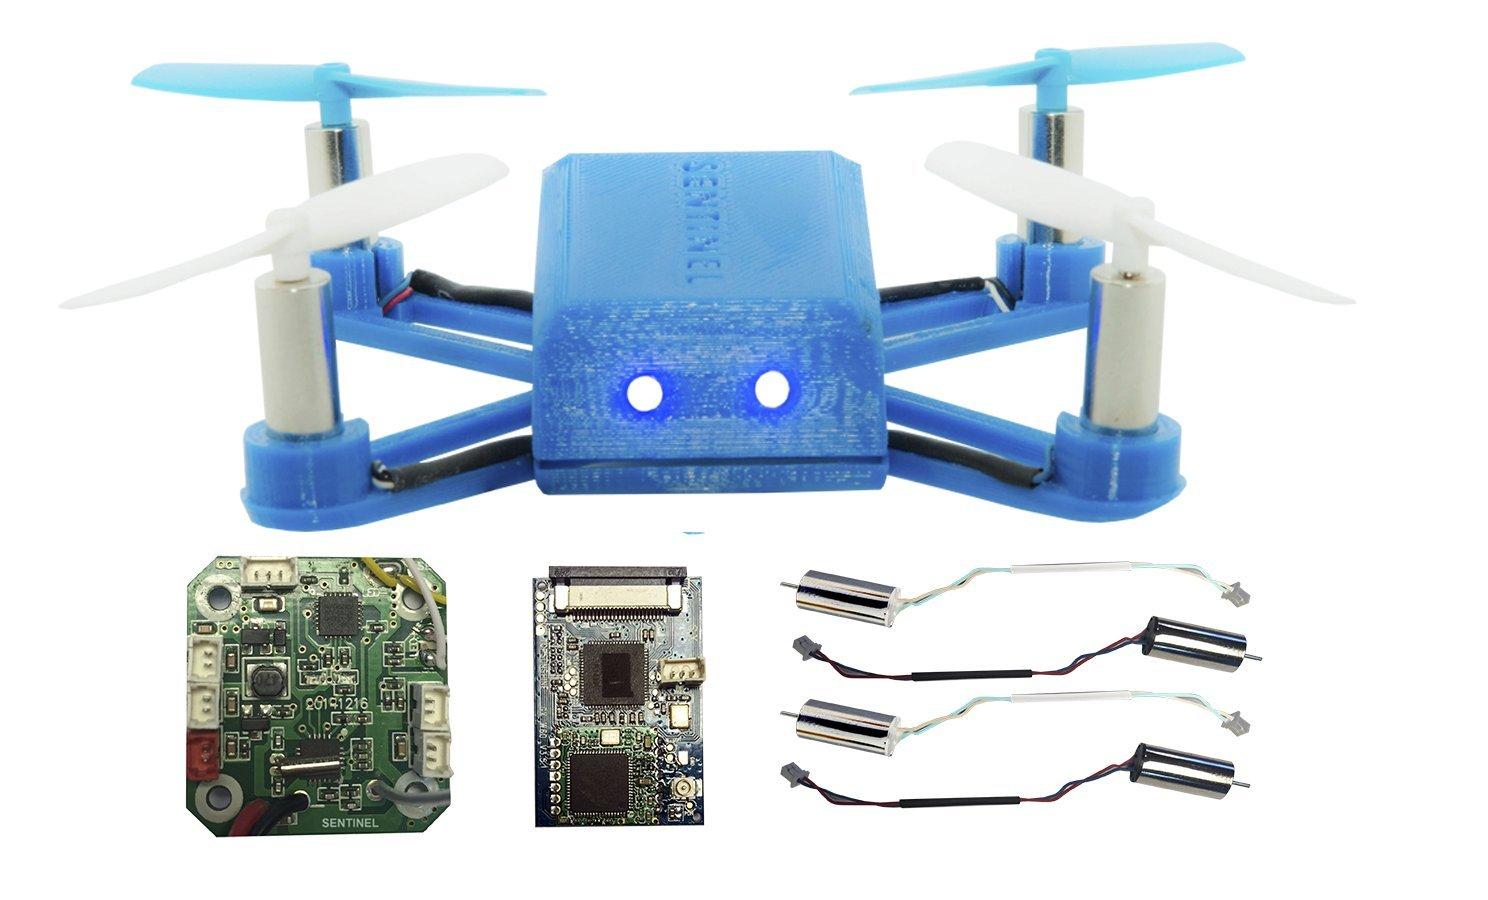 SENTINEL DRONE TRAINING X Monta tu propio drone: Amazon.es: Hogar